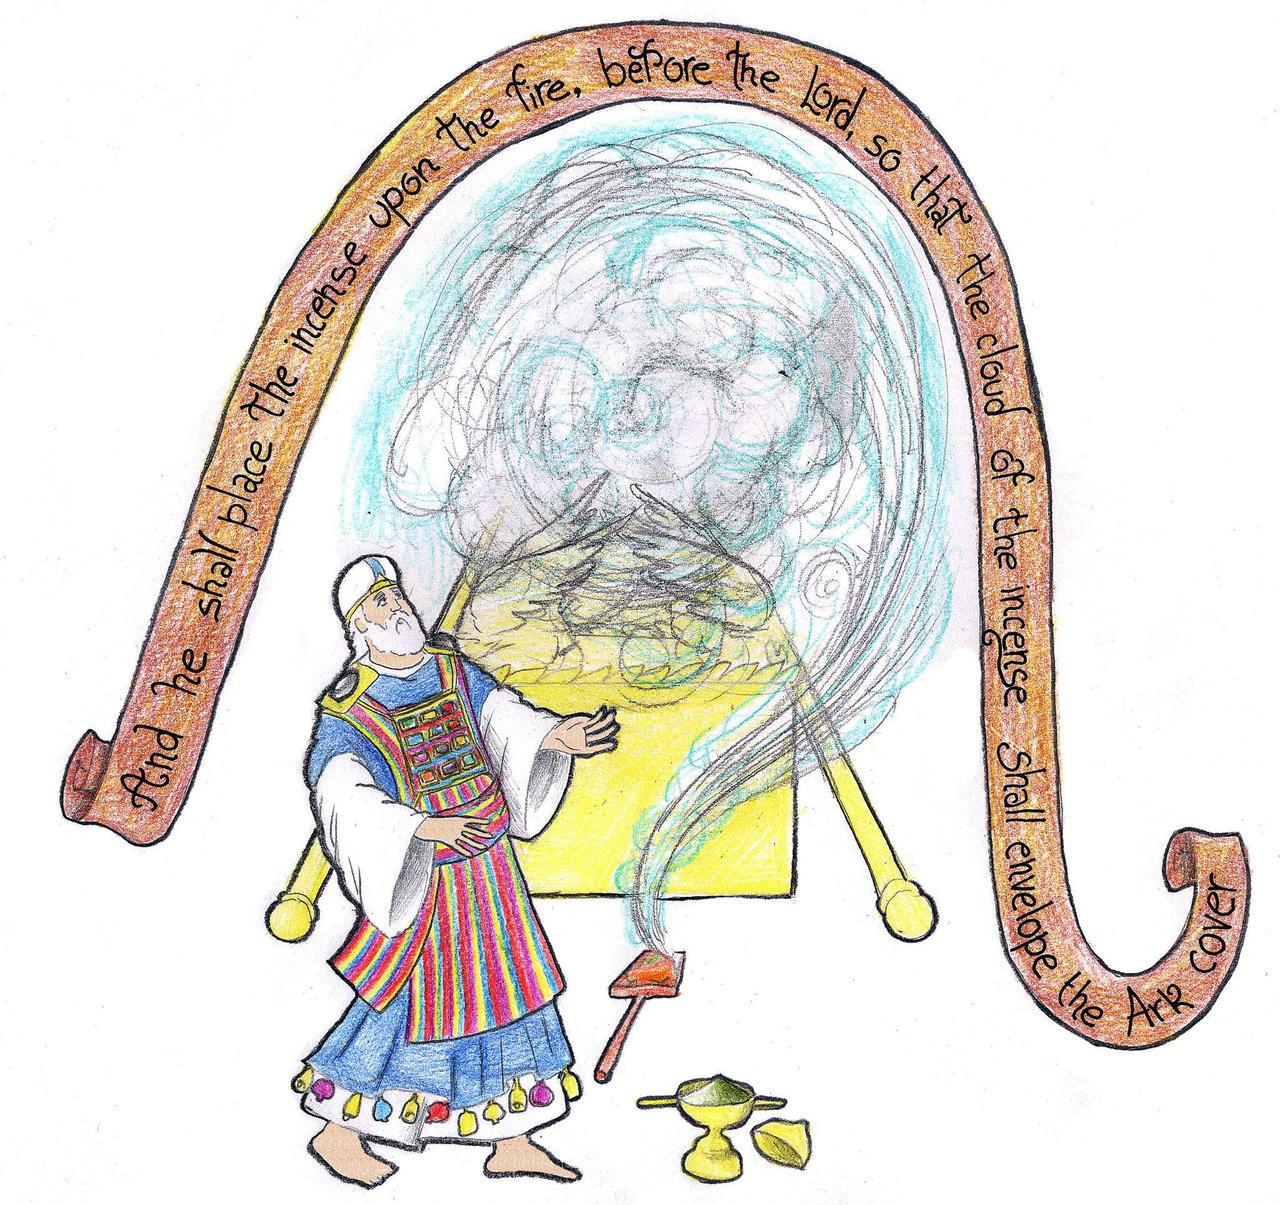 Leviticus 16:12-13 (The Incensation) by Parastos